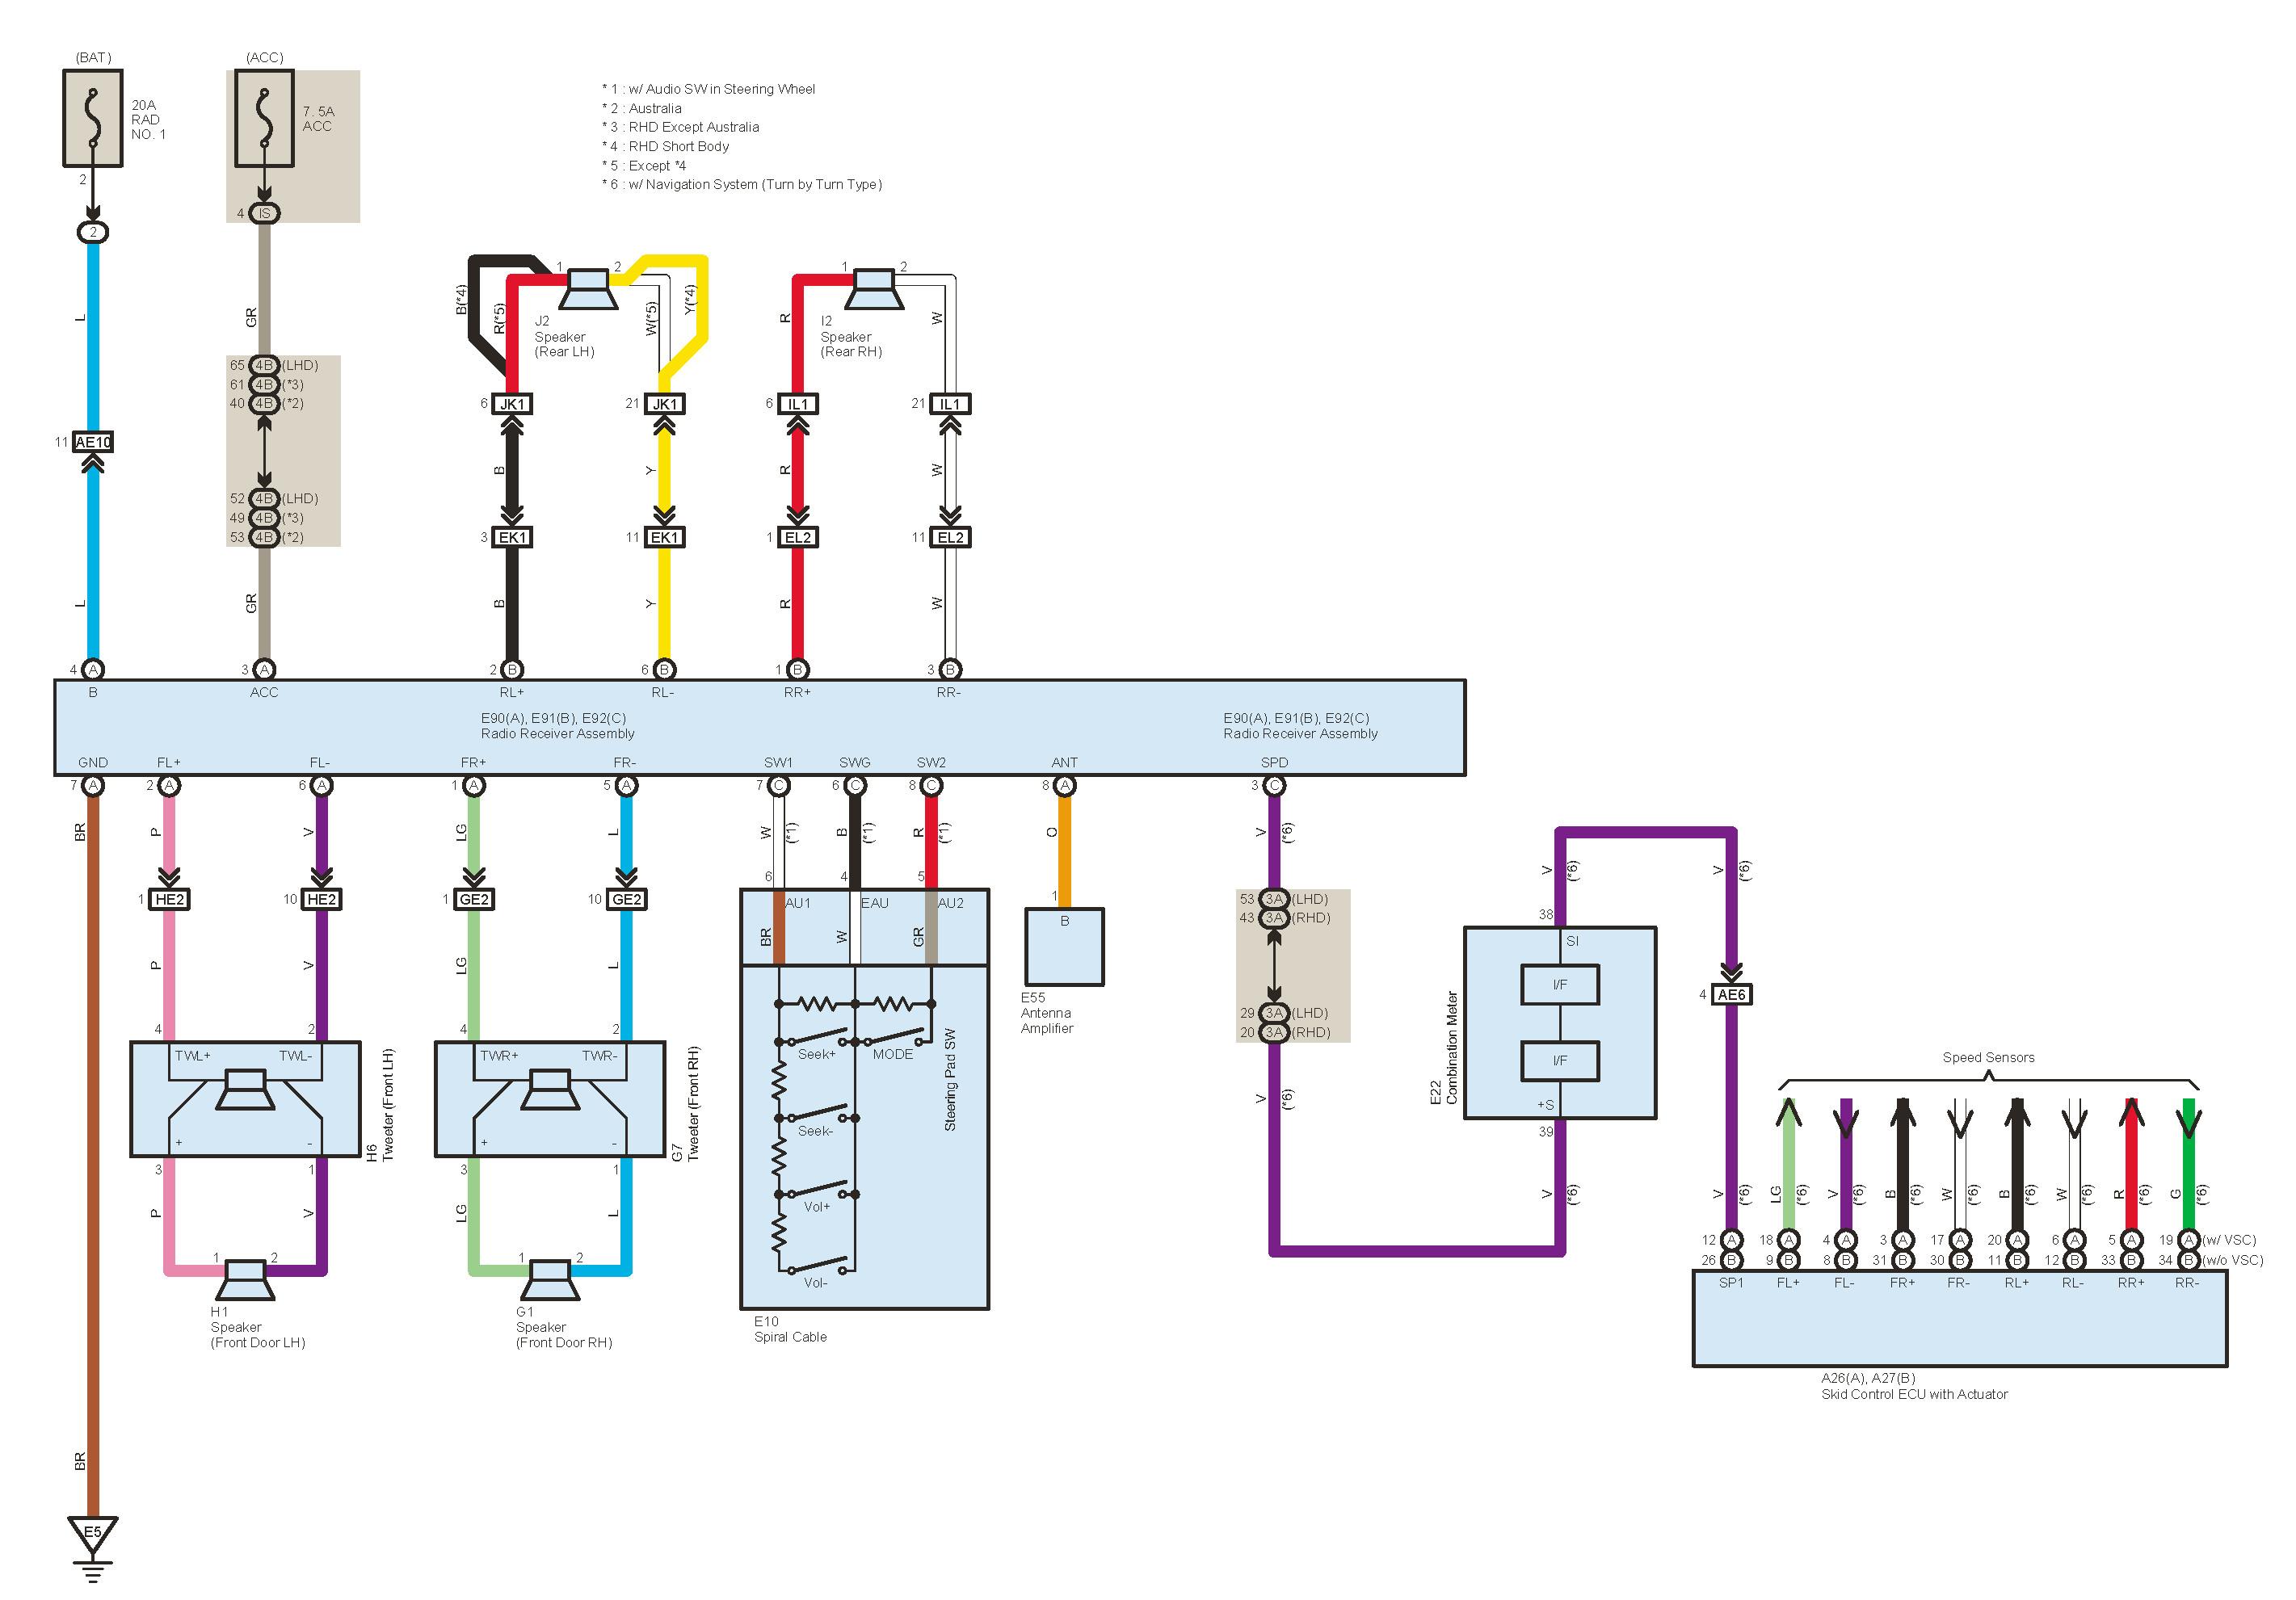 Viper 5706V Wiring Diagram 2014 Tundra | Wiring Diagram - Viper 5706V Wiring Diagram